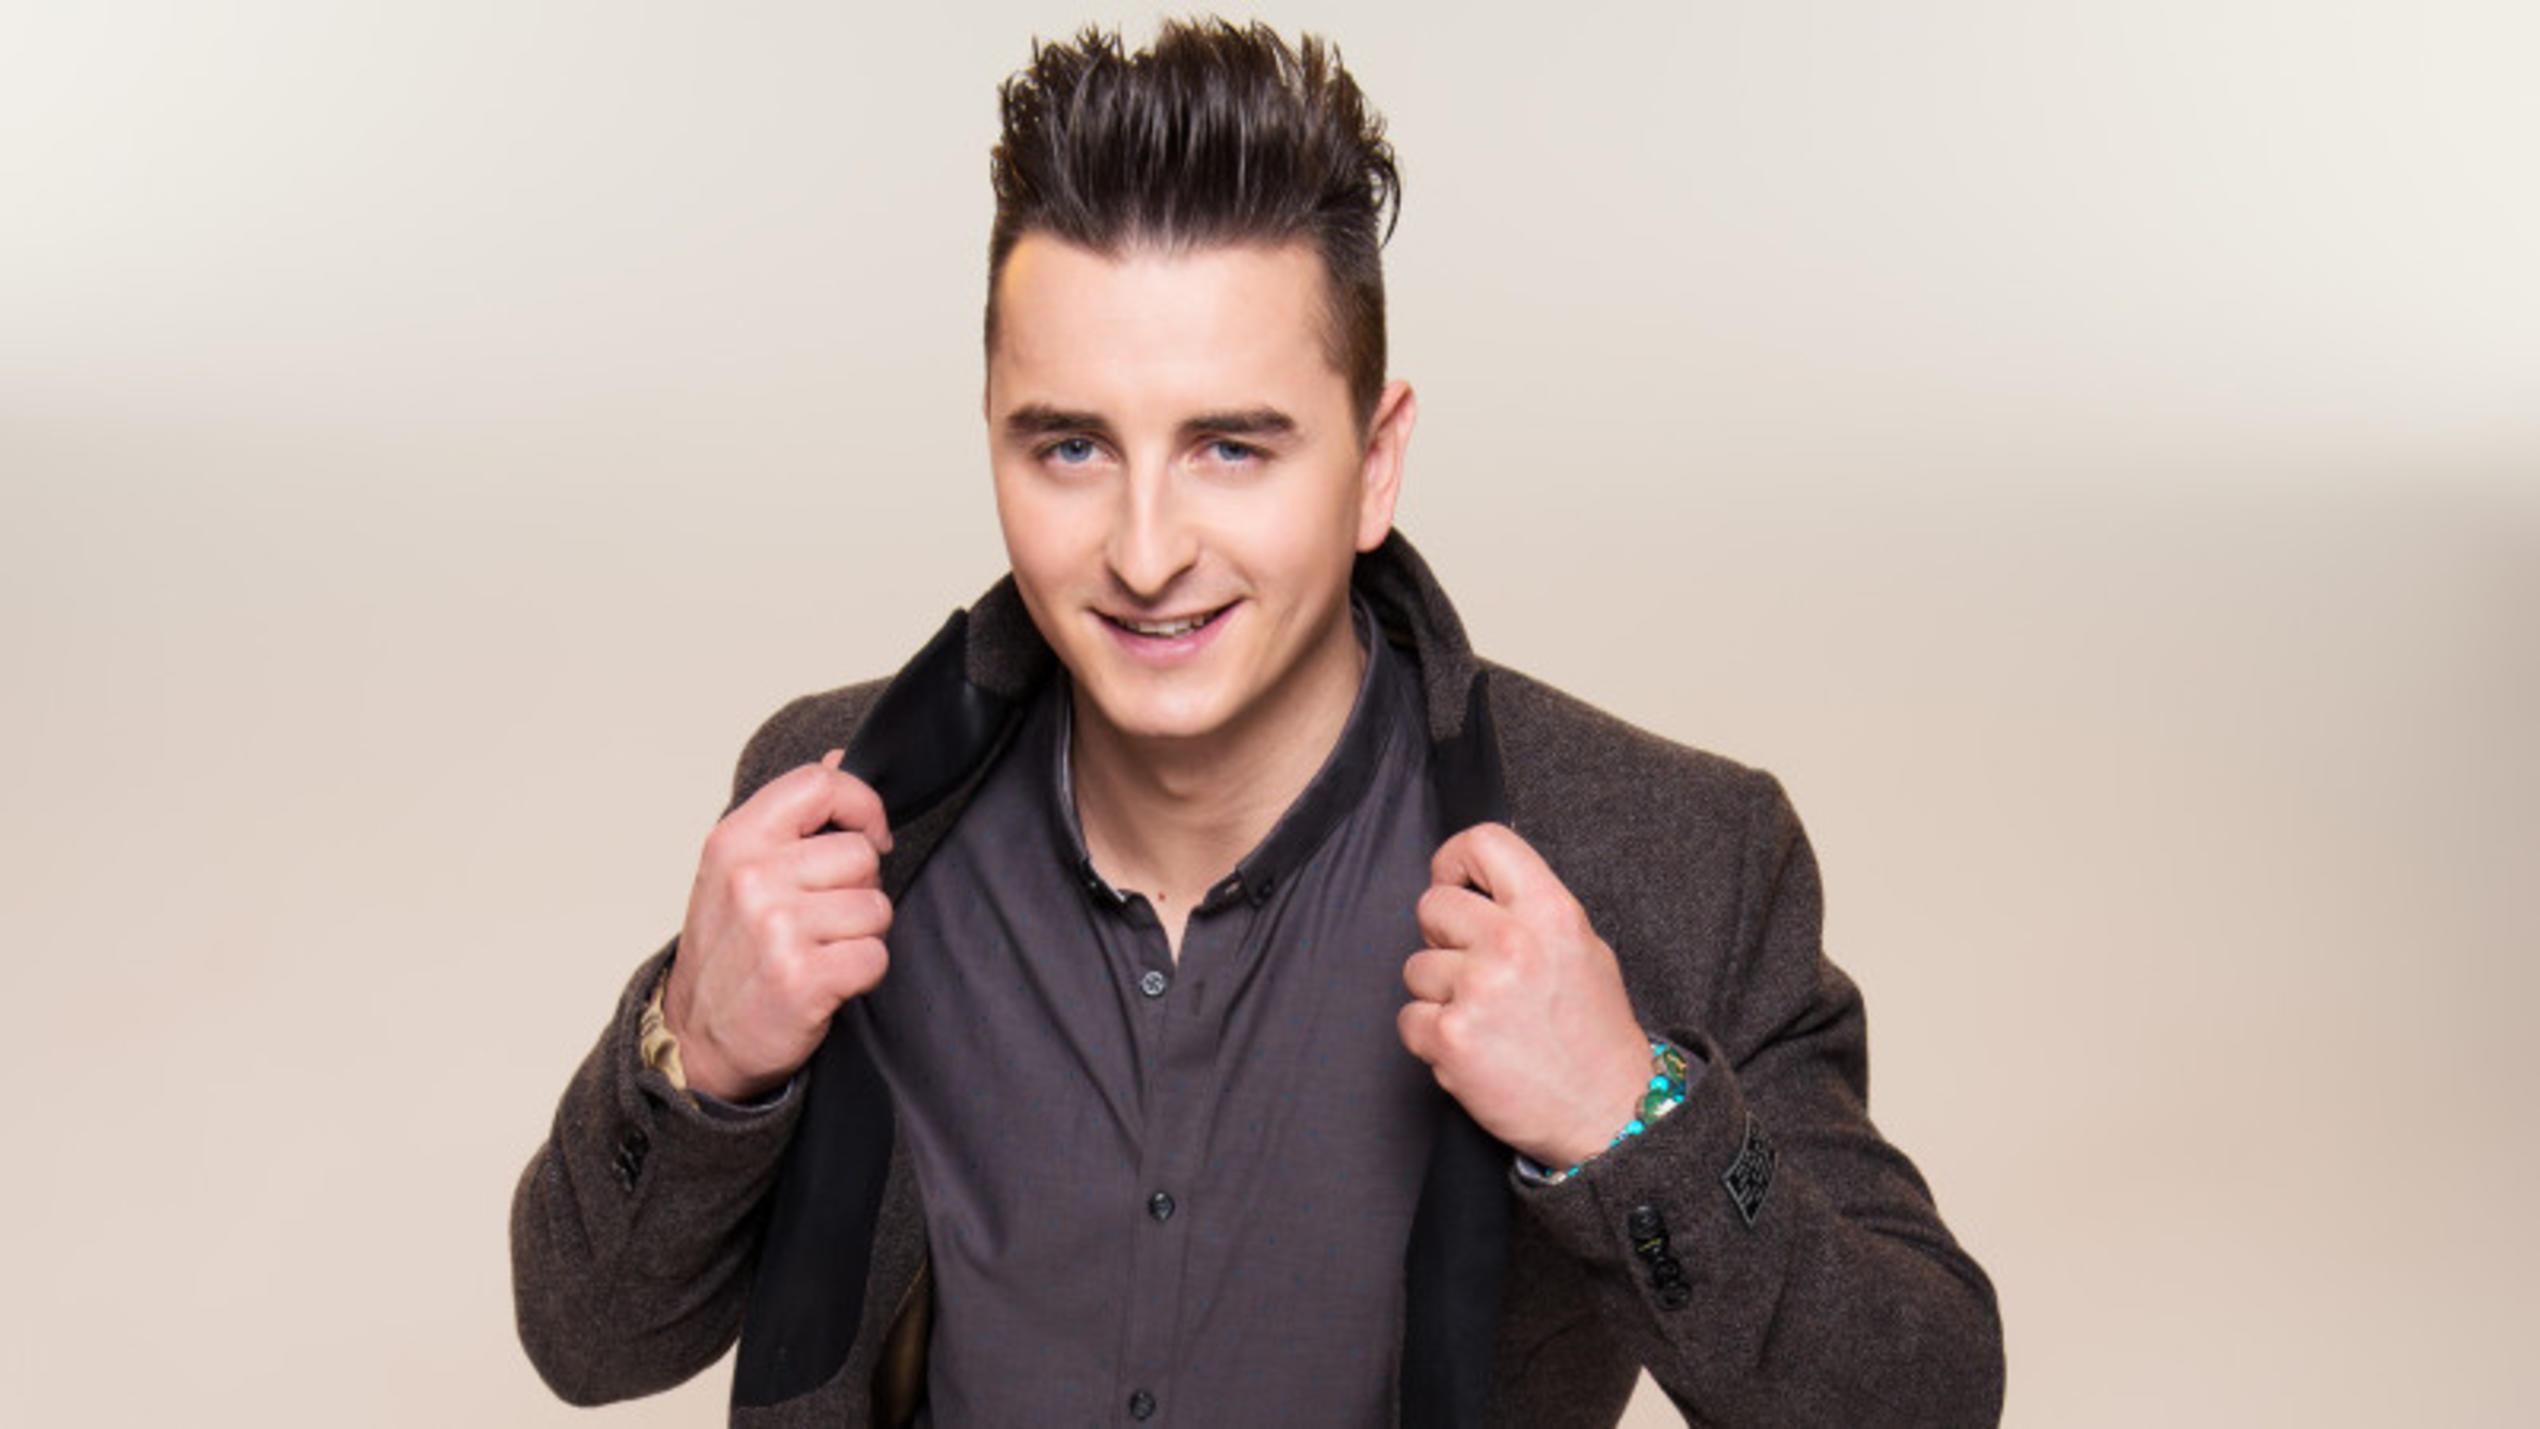 Sing Meinen Song 2014 Andreas Gabalier